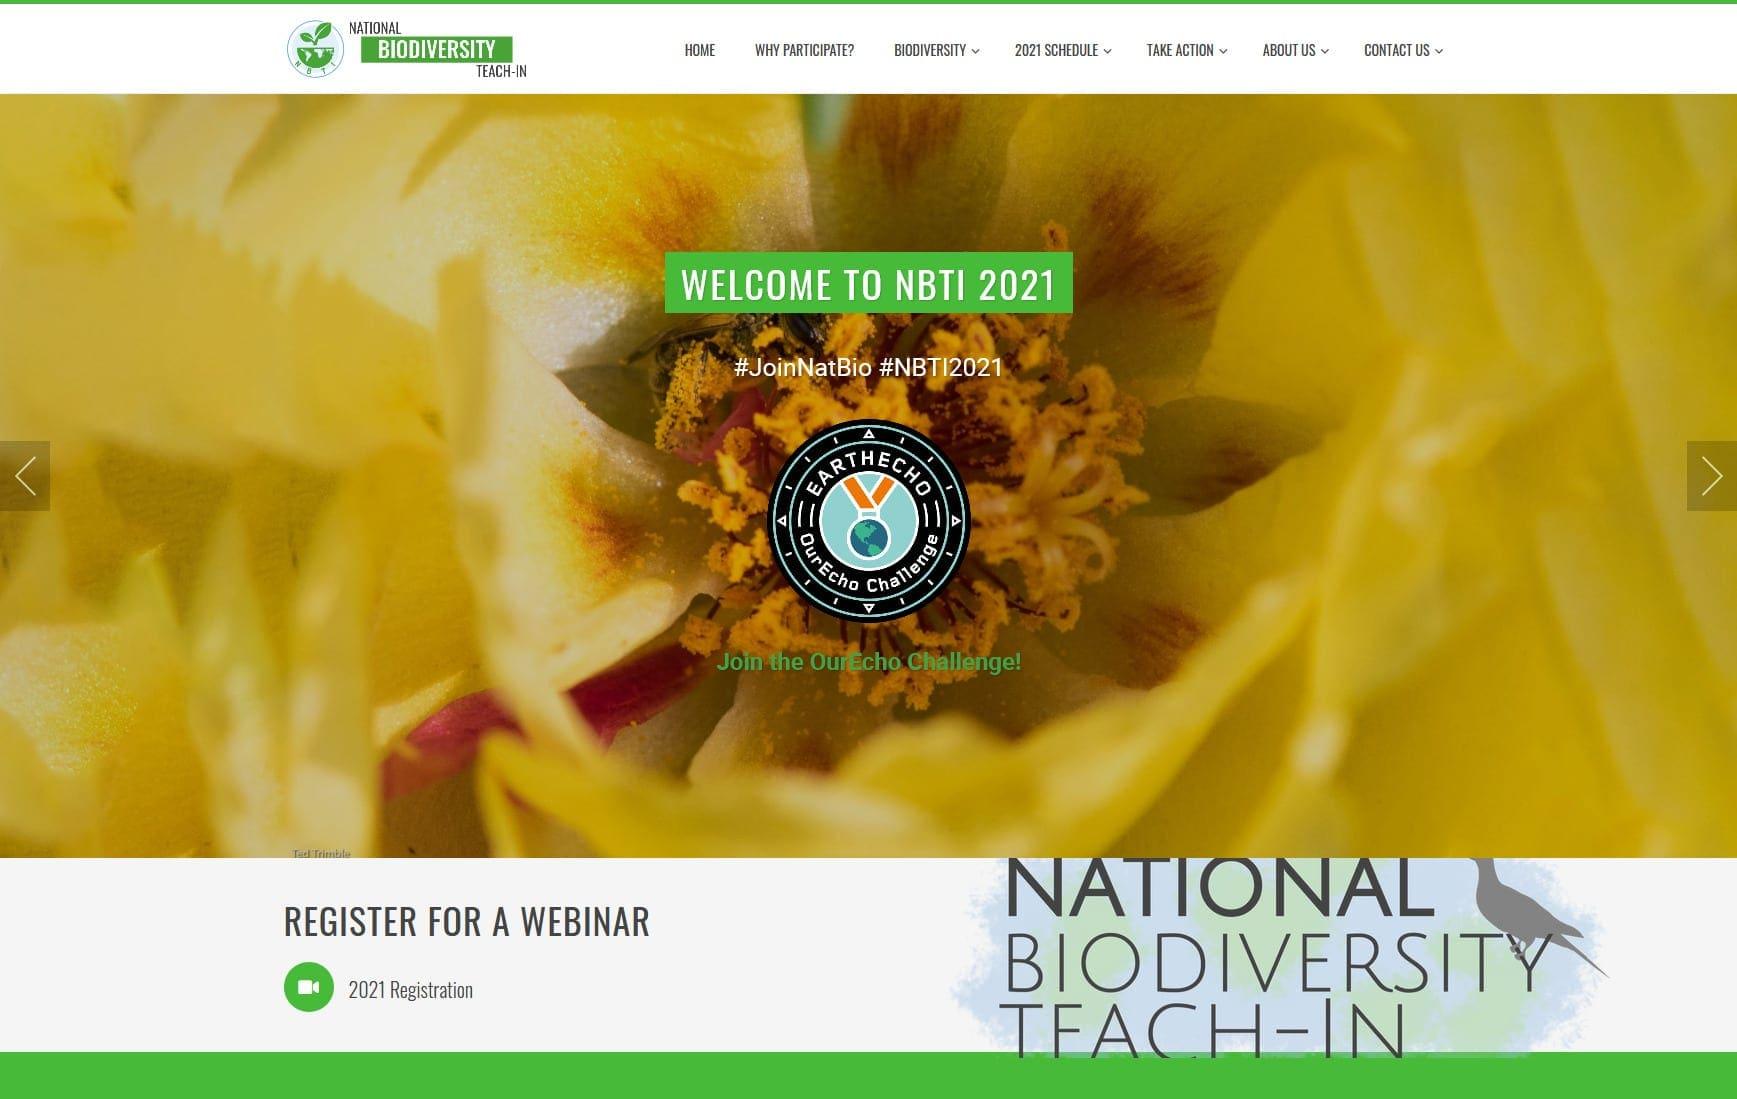 National Biodiversity Teach In